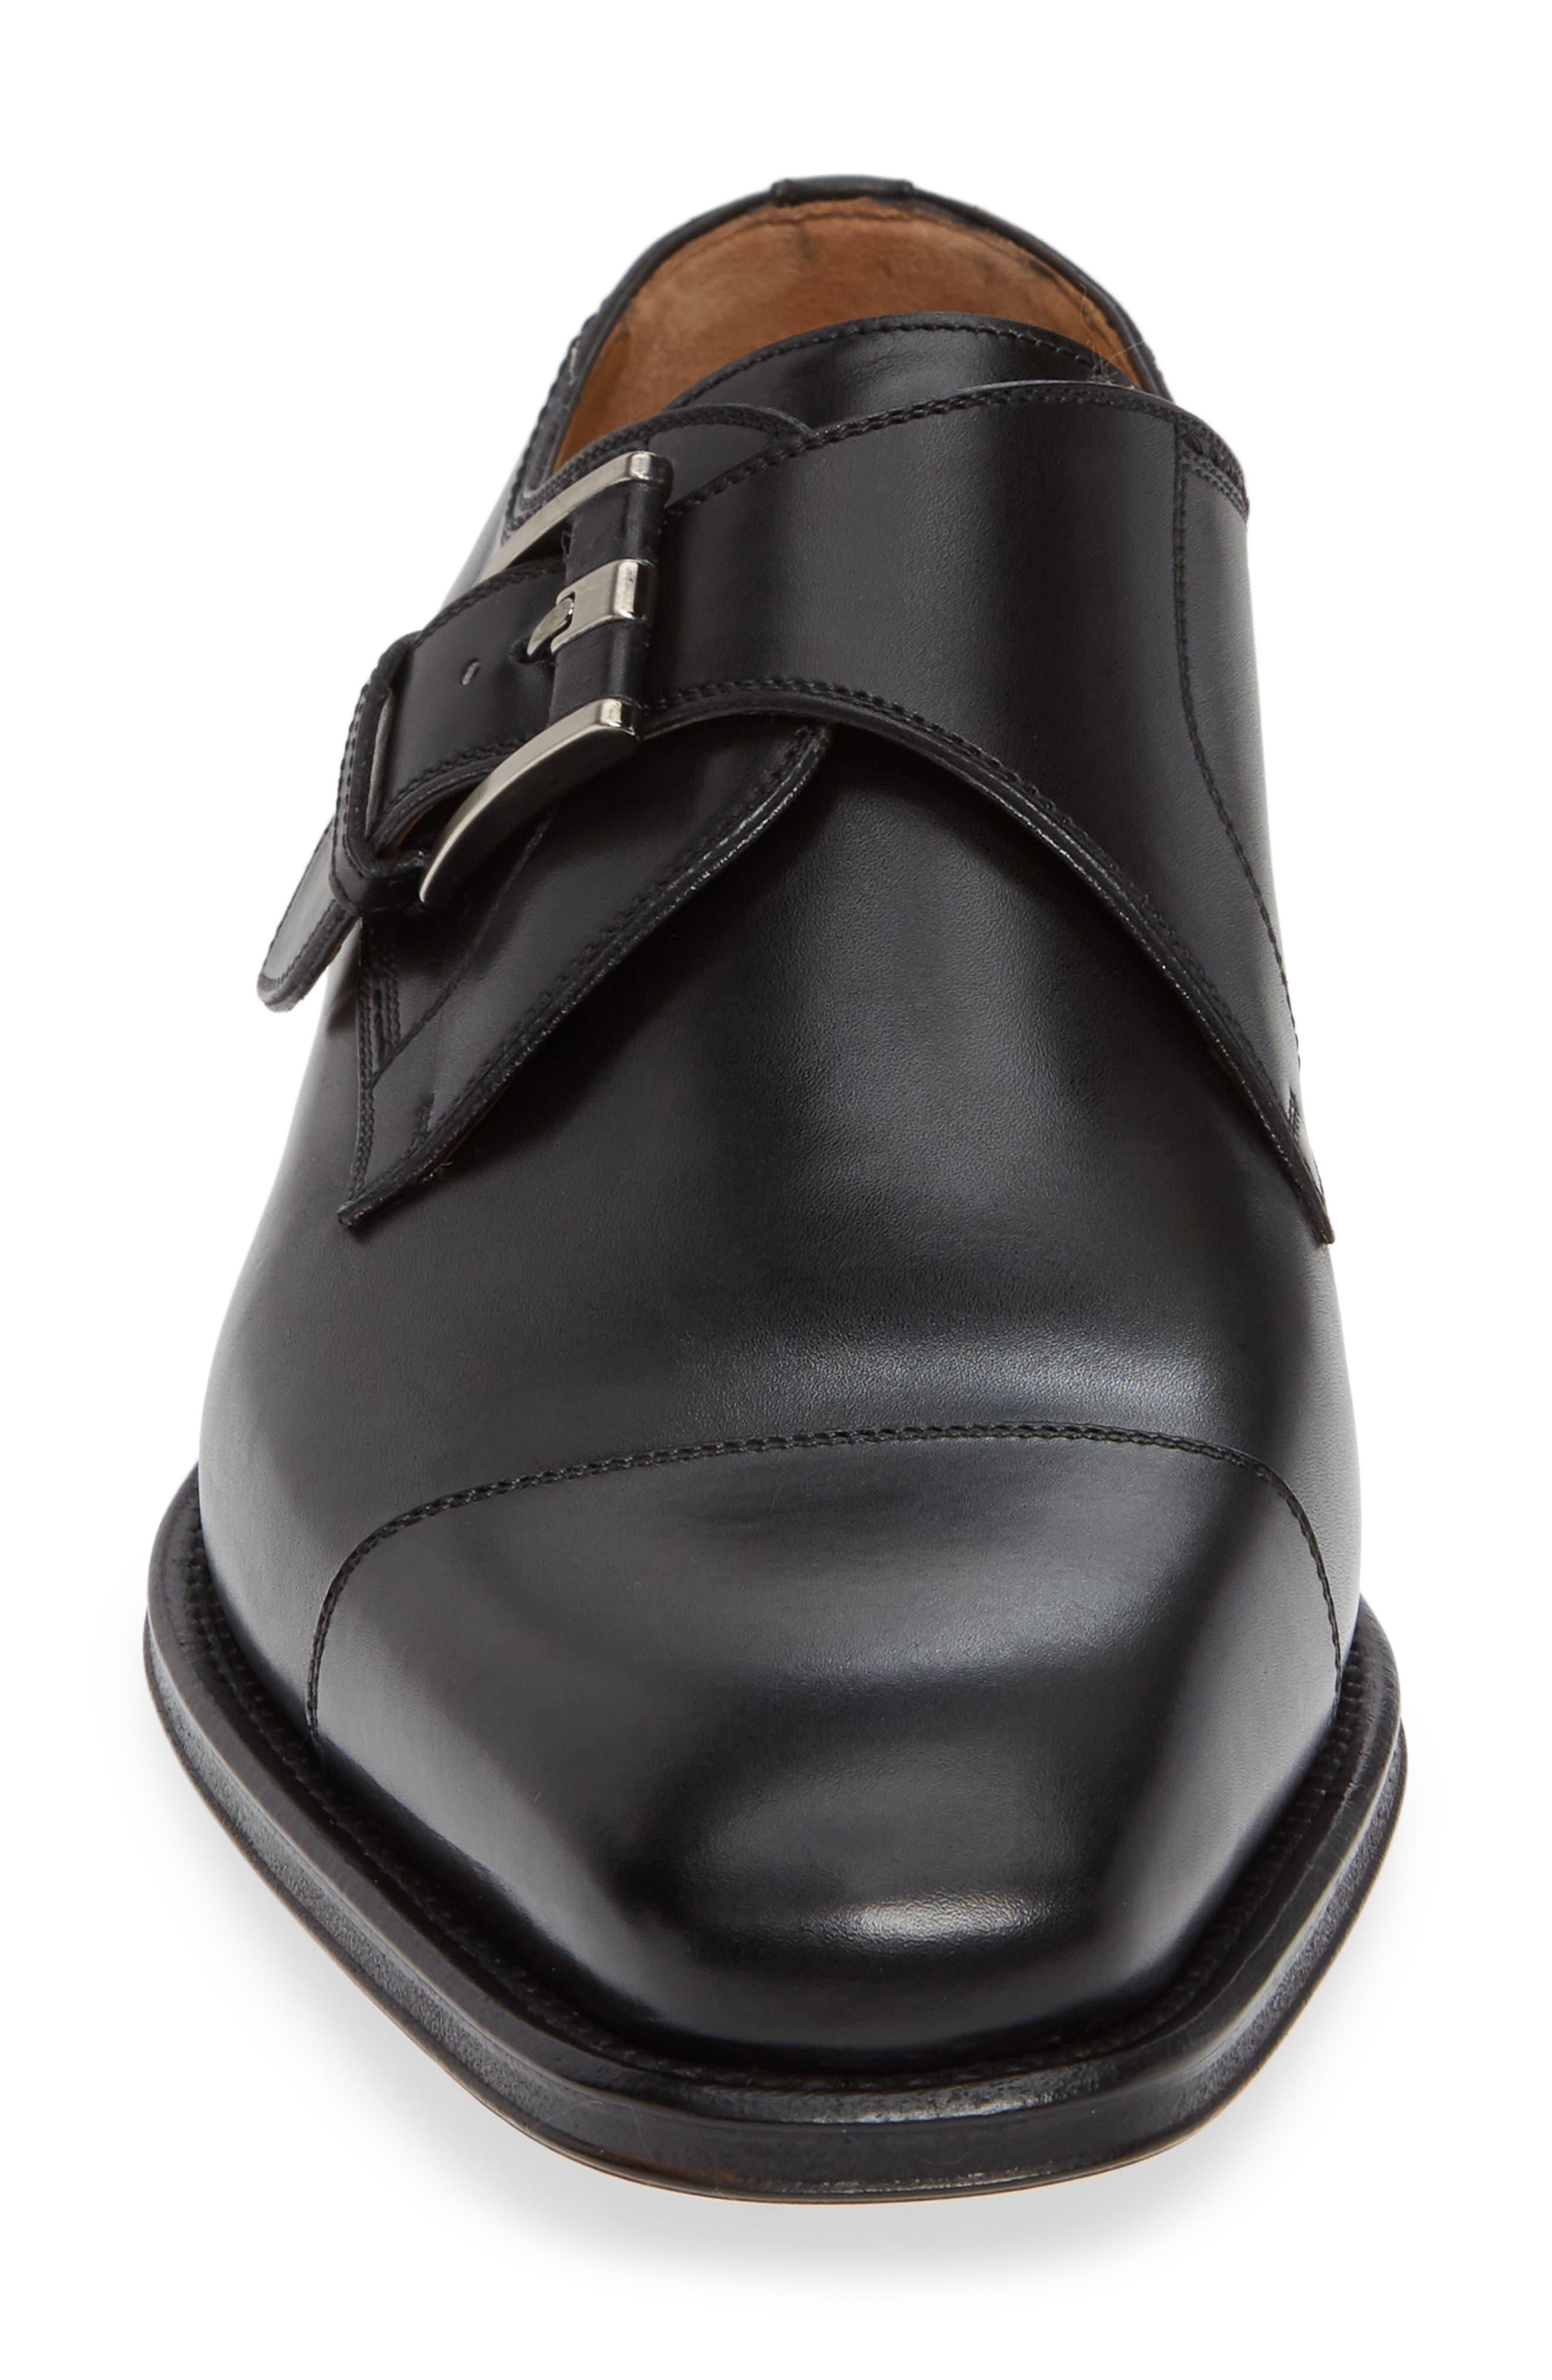 Lennon Monk Strap Shoe,                             Alternate thumbnail 4, color,                             BLACK LEATHER